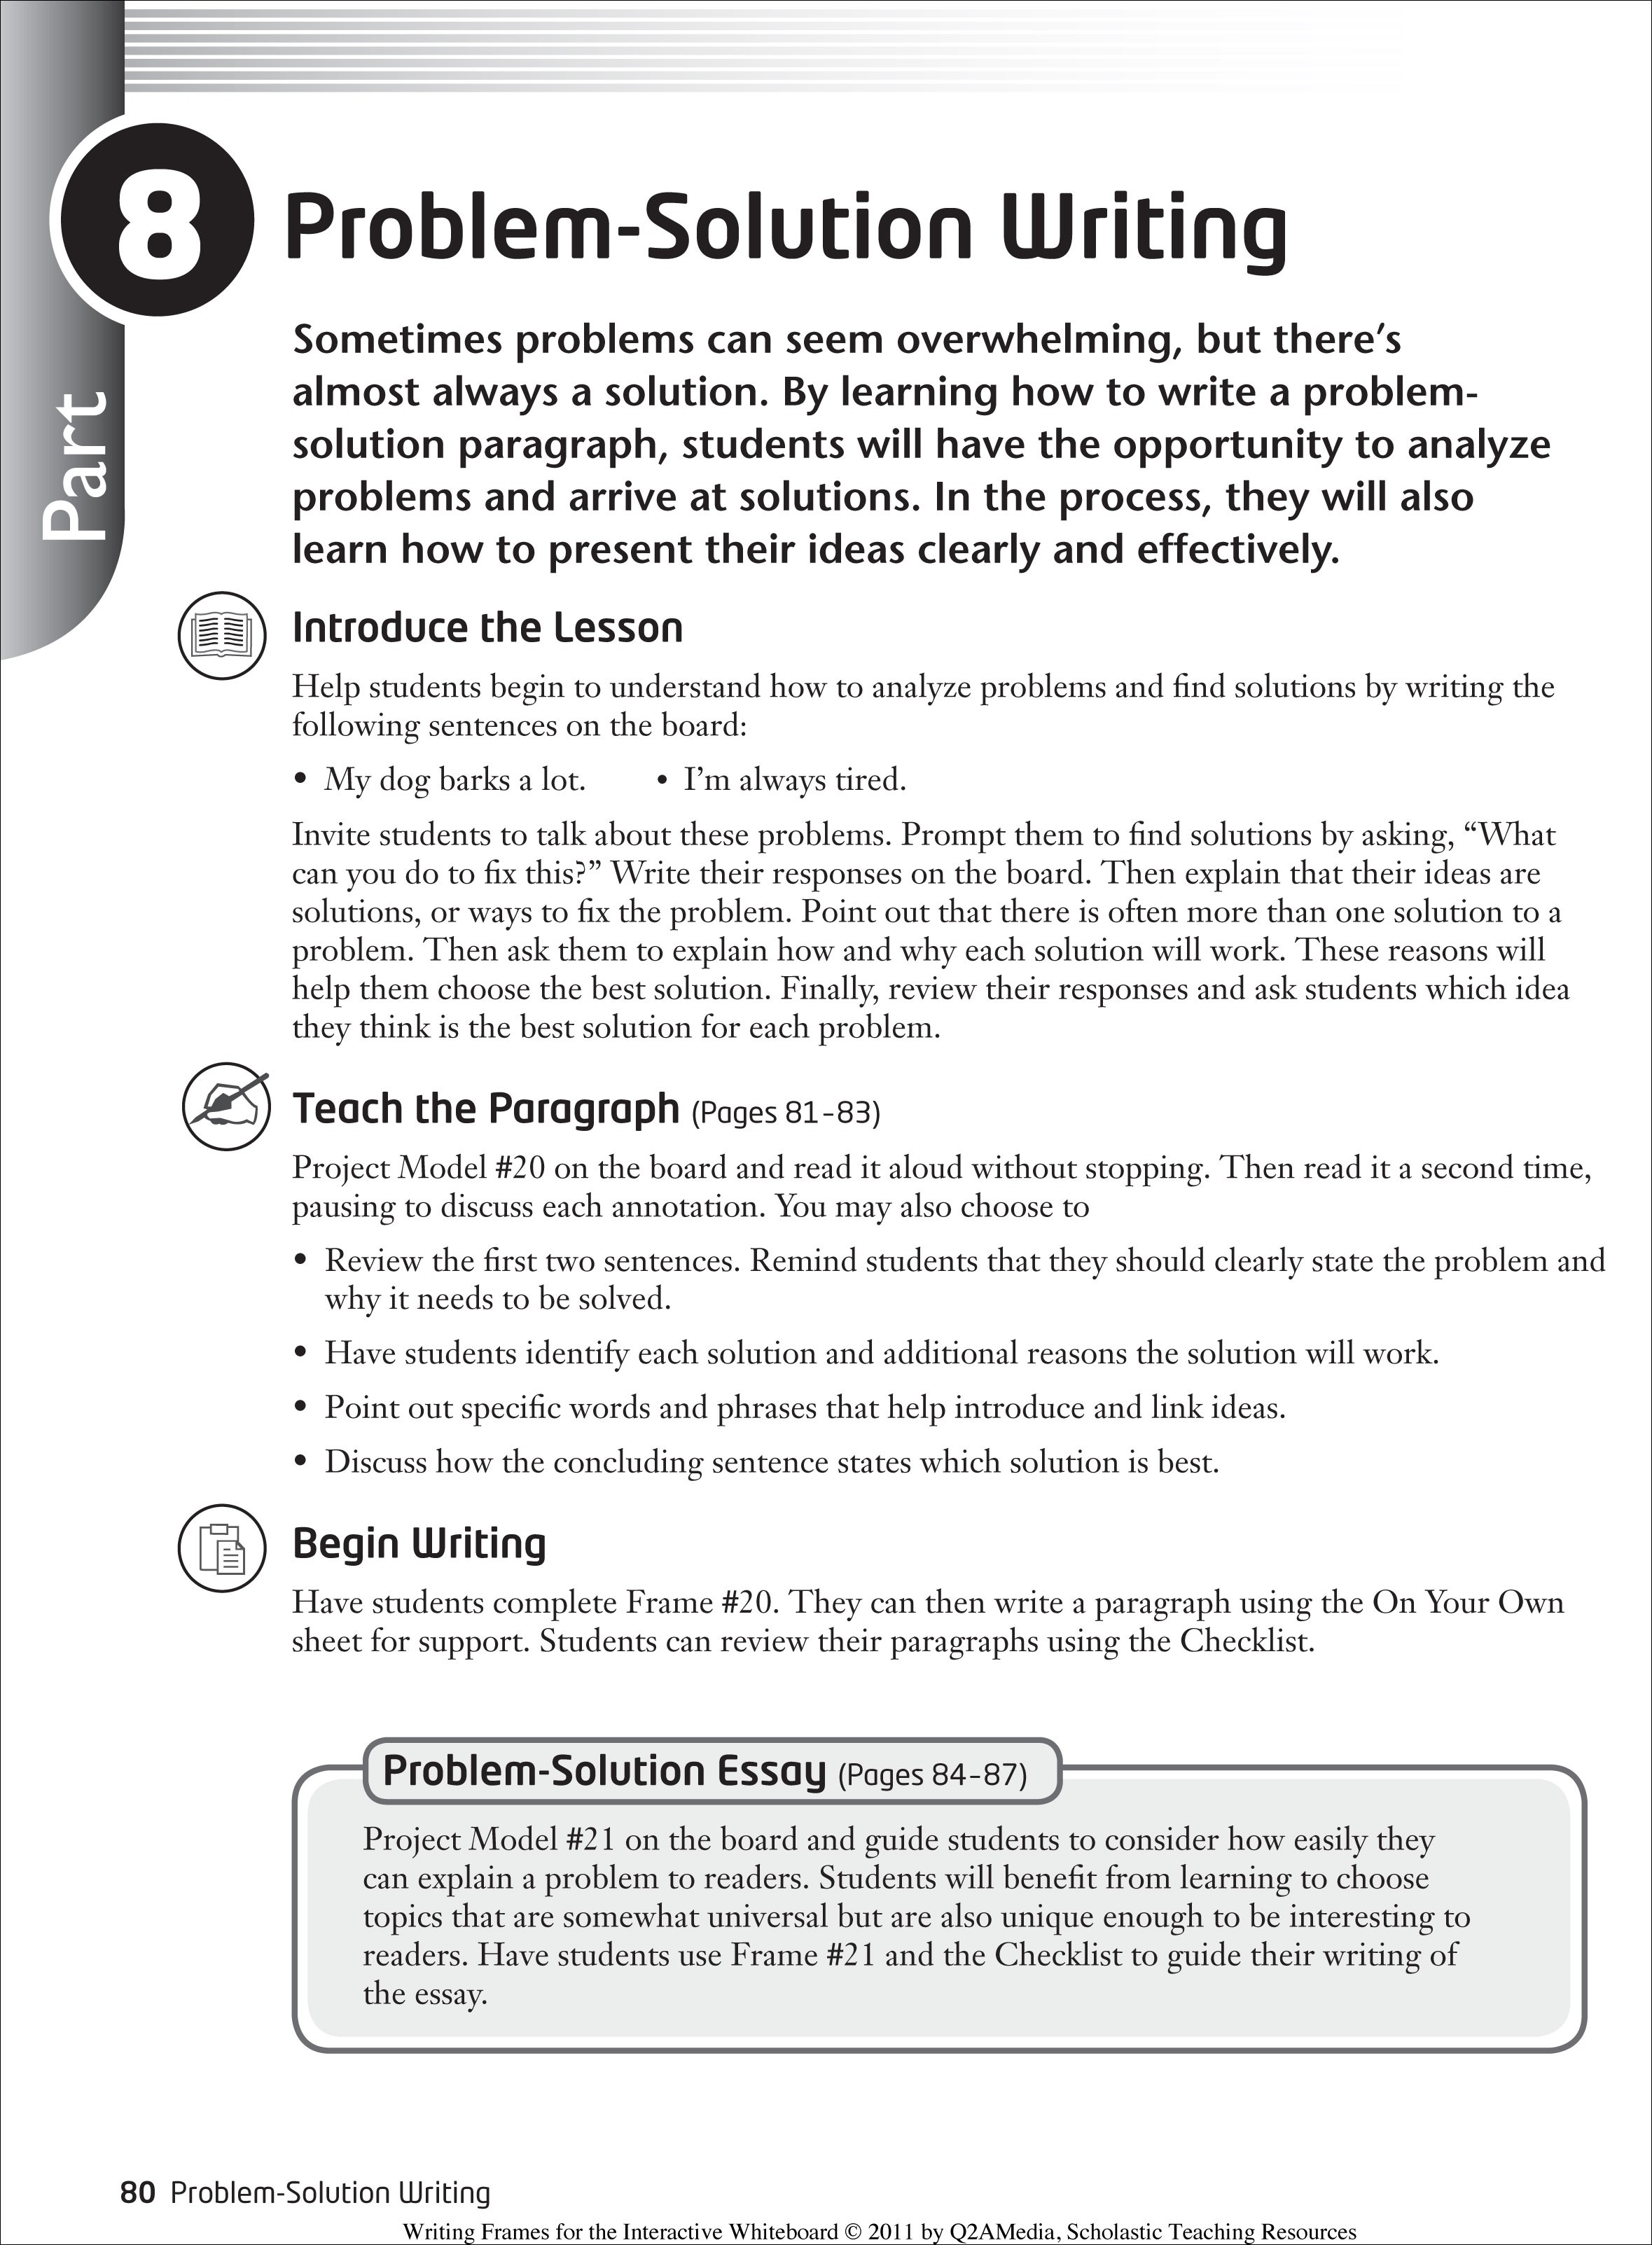 002 Brilliant Ideas Of Epiphany Essay Problem Solving Example